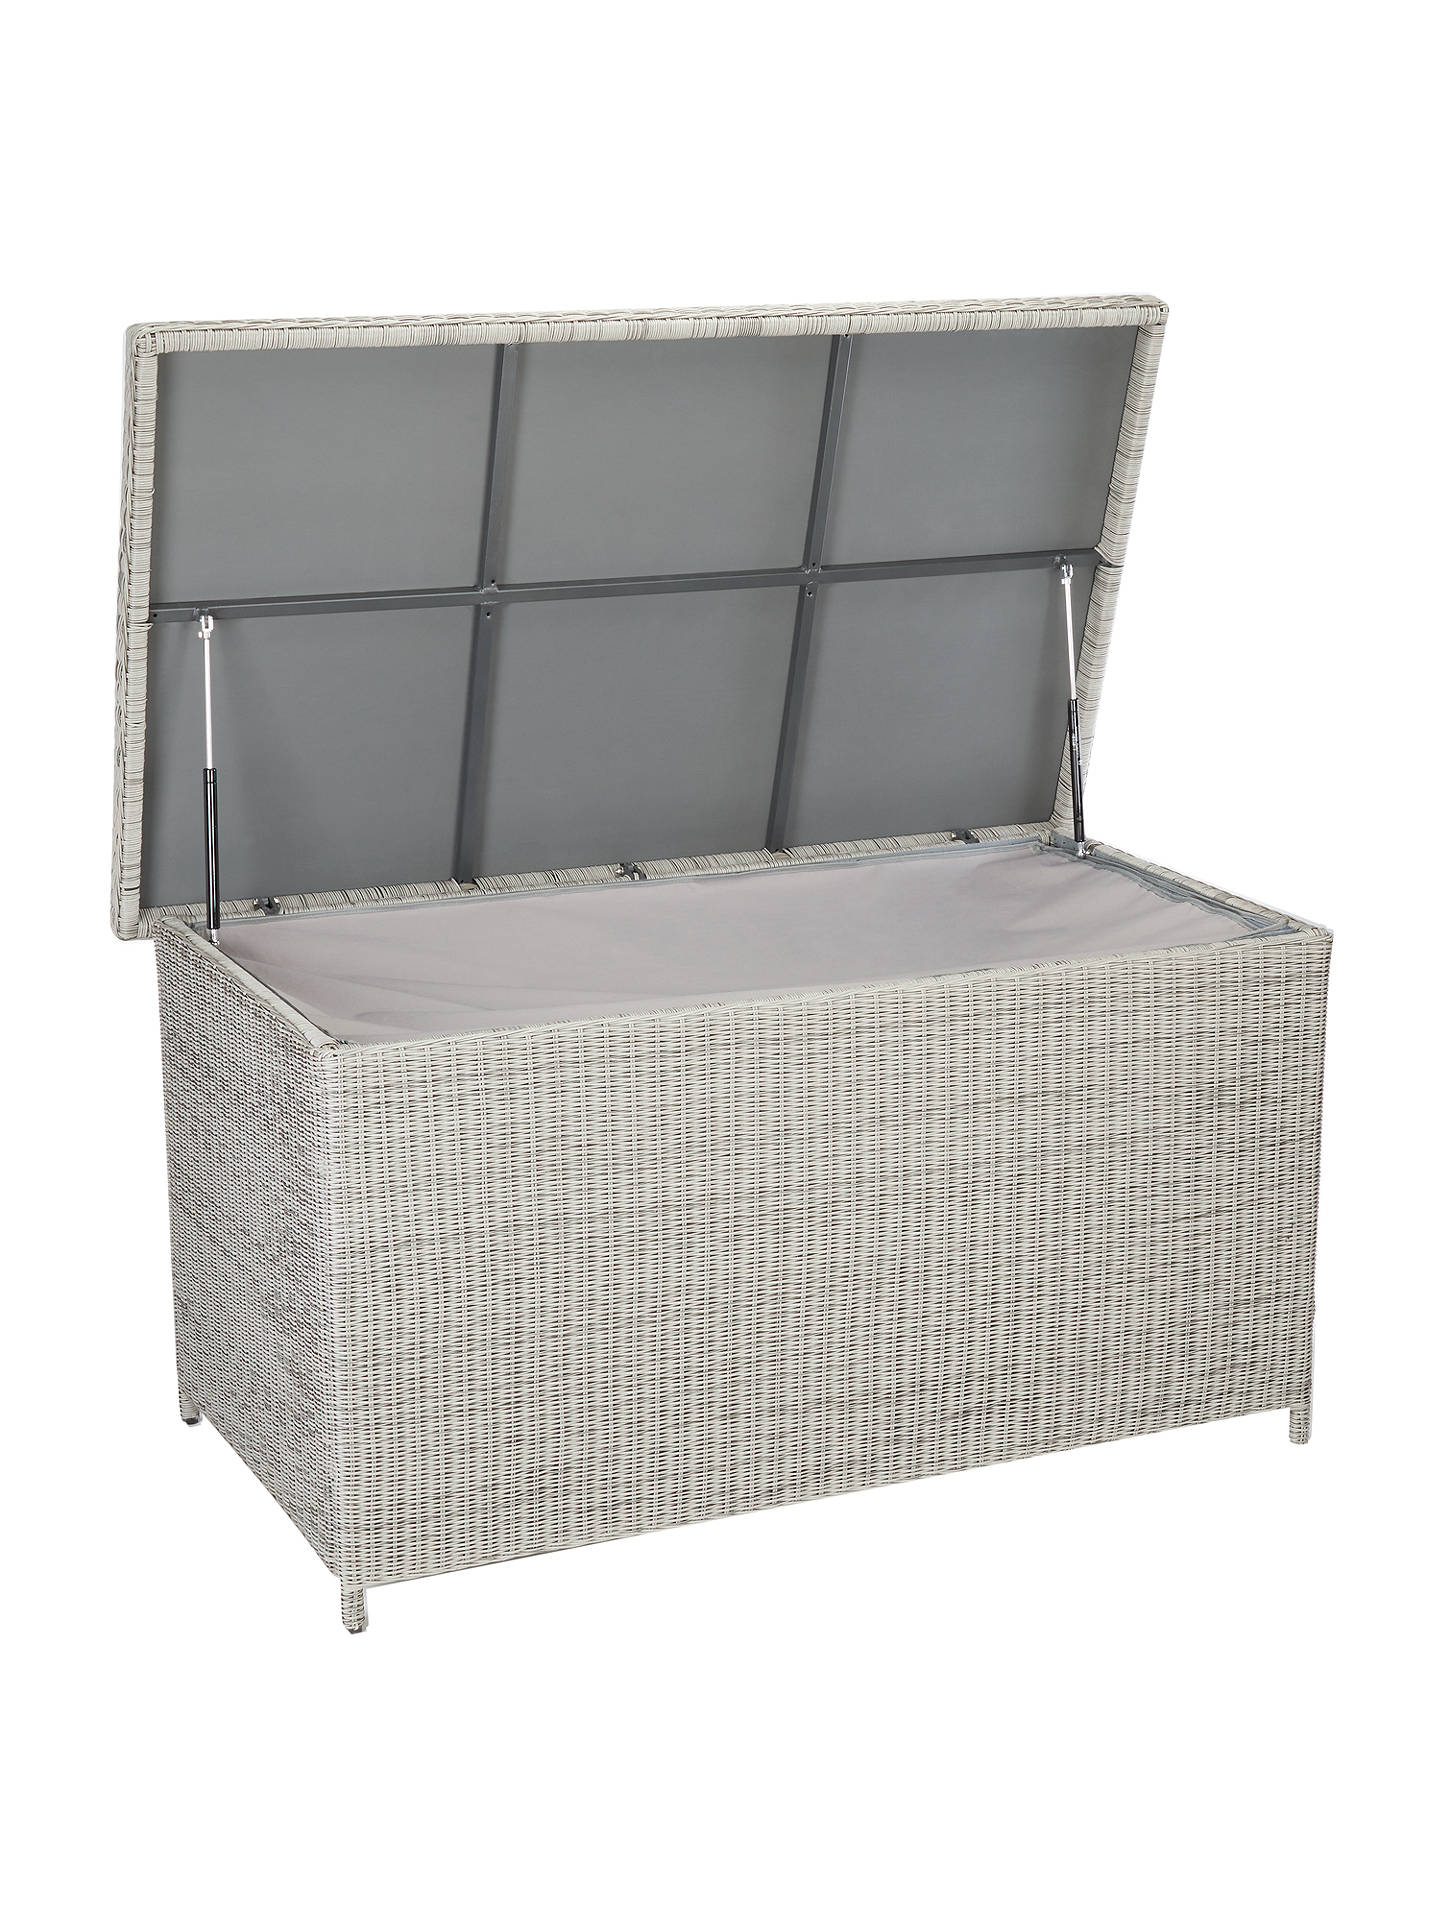 Tremendous John Lewis Partners Dante Garden Cushion And Storage Box Grey Inzonedesignstudio Interior Chair Design Inzonedesignstudiocom